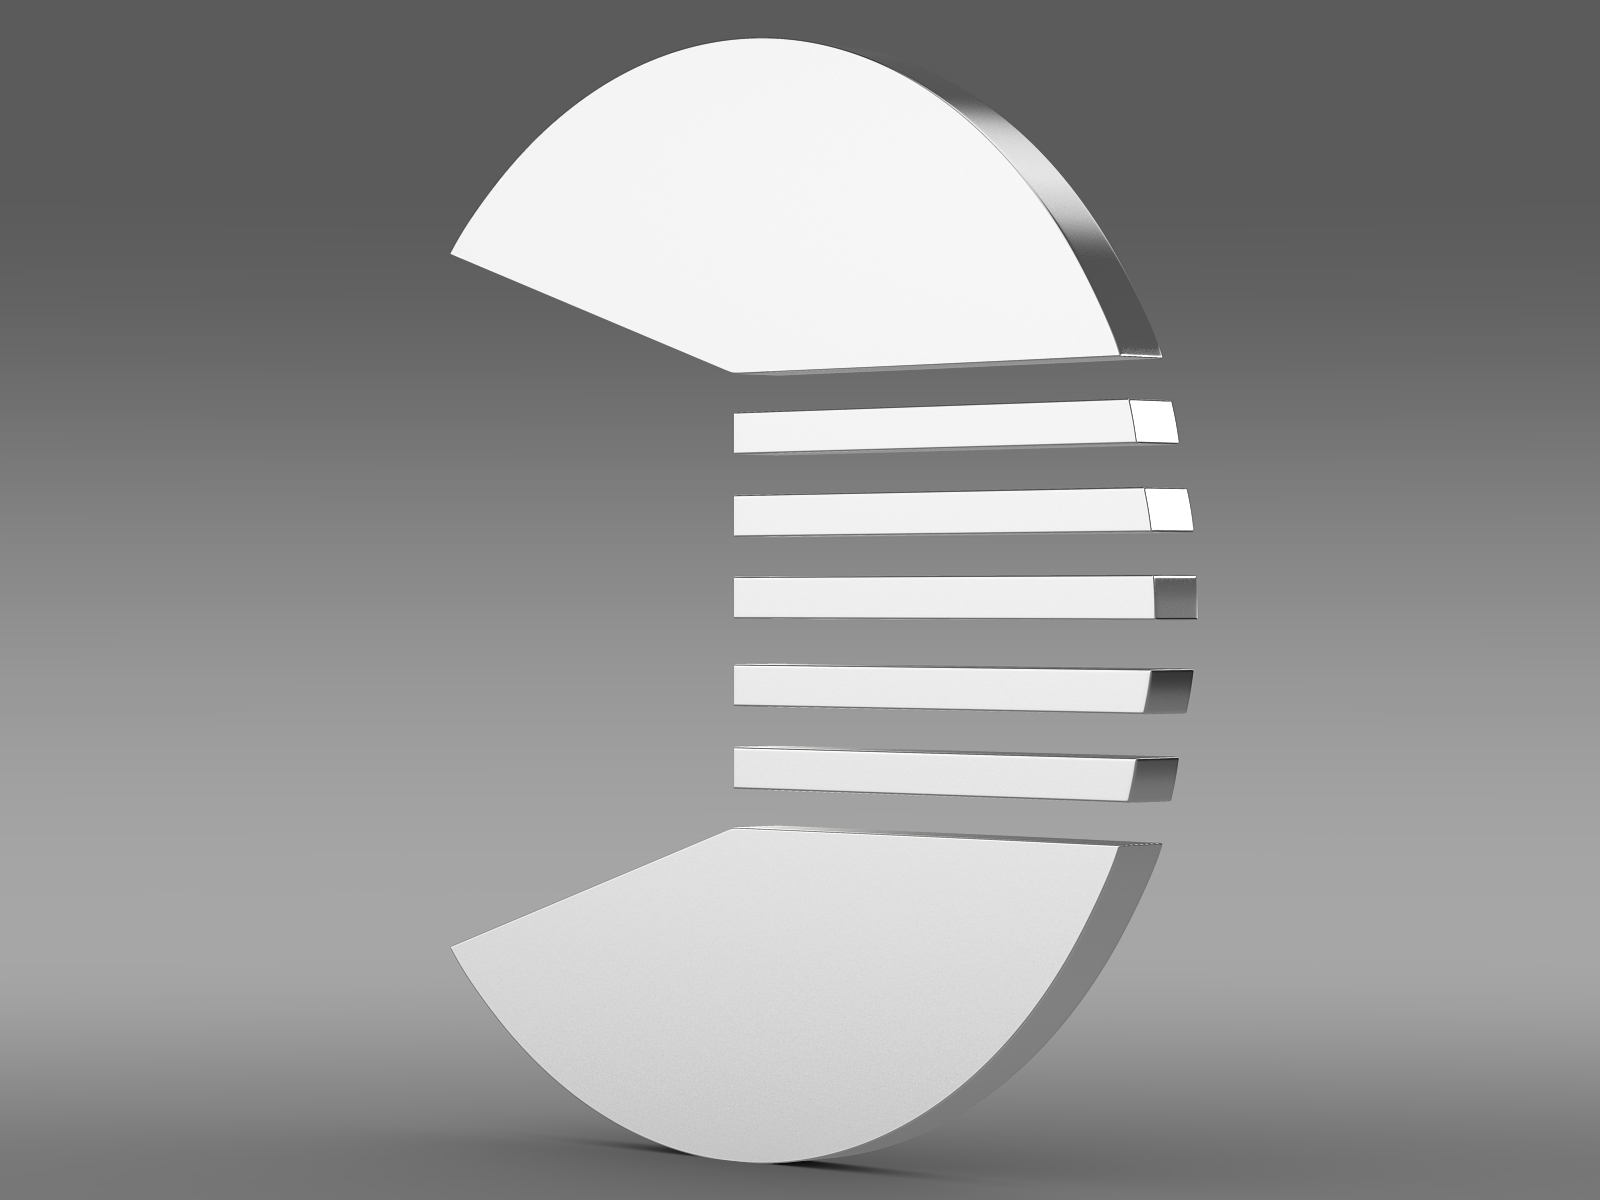 quant logo 3d model 3ds max fbx c4d lwo ma mb hrc xsi obj 213253